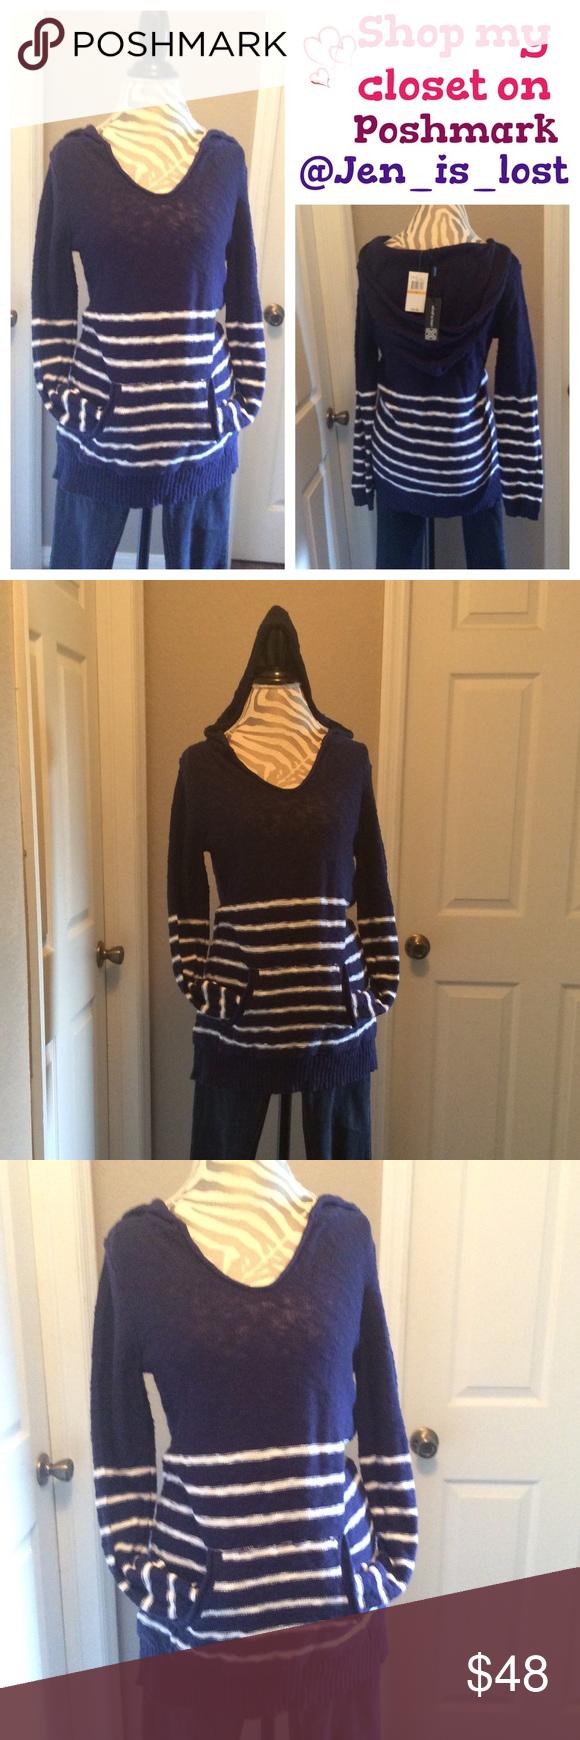 🎂 Anniversary Sale 🎂 Navy Seal Sweater Hoodie Oversized ...